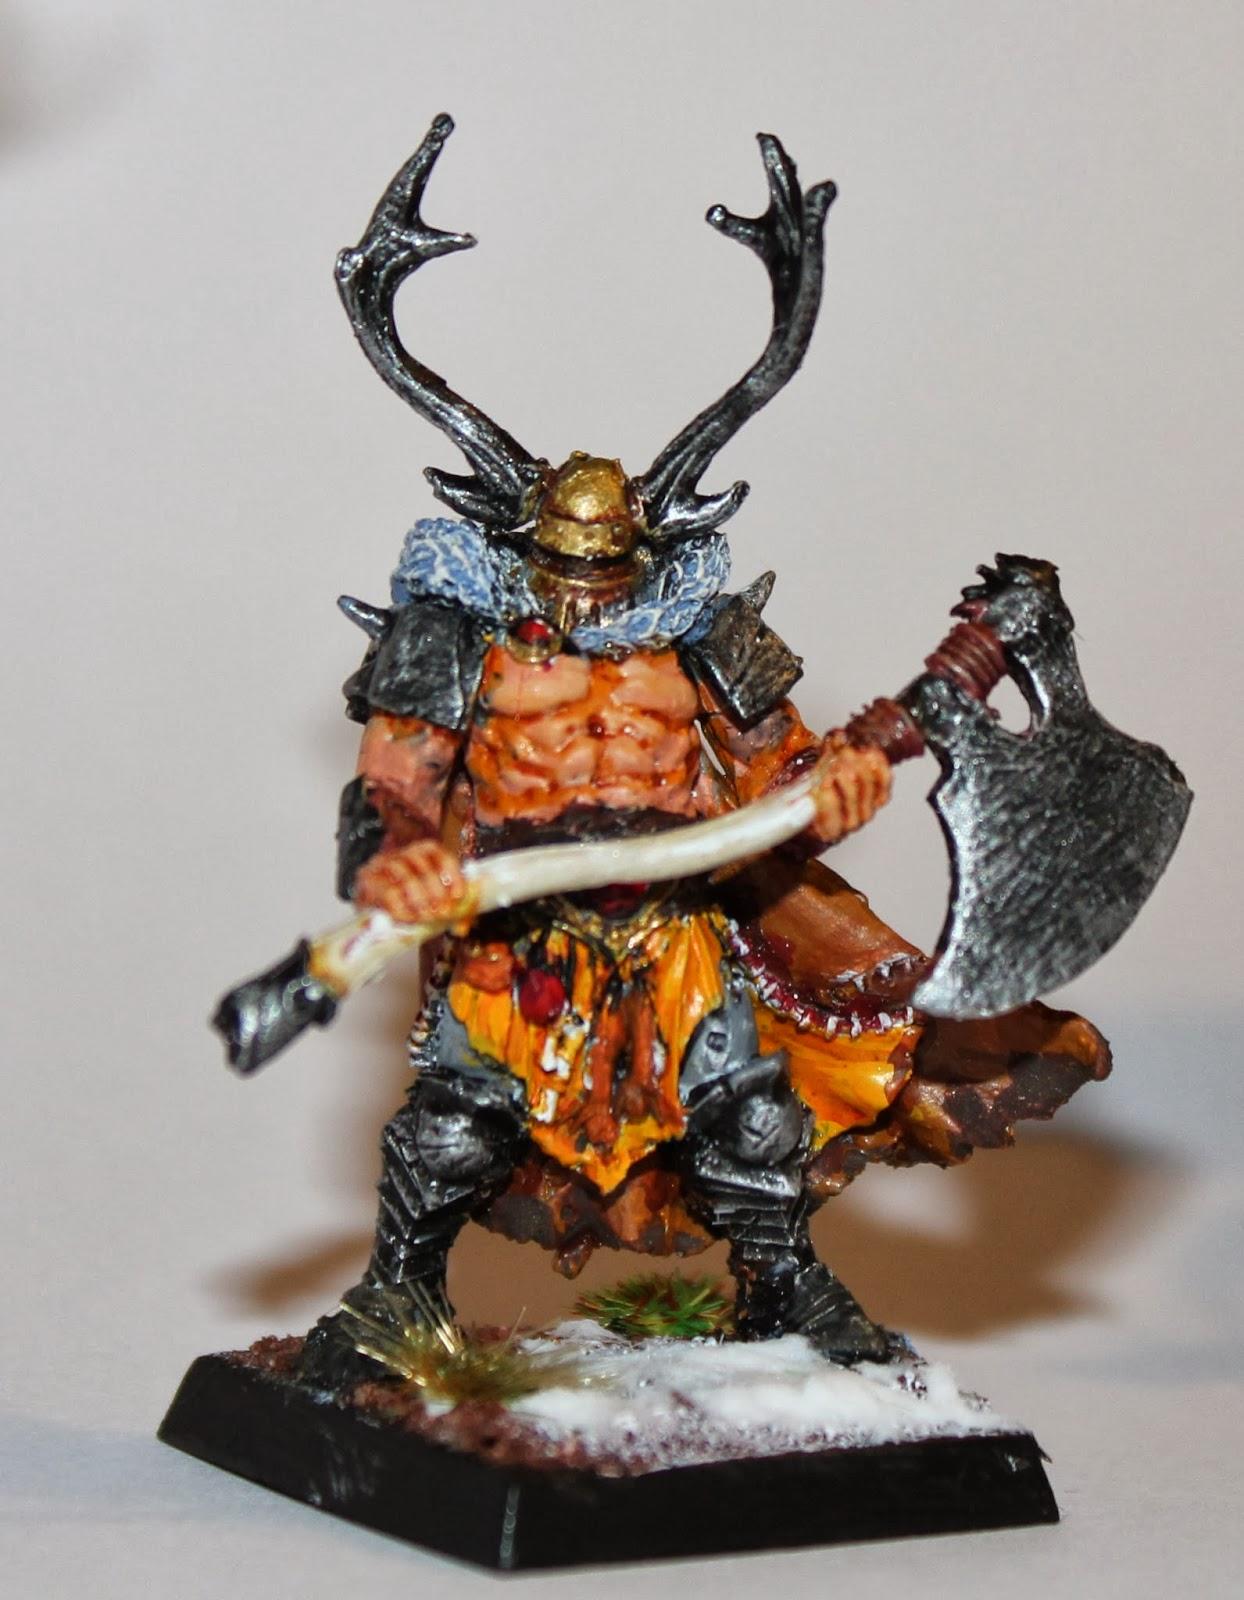 Warhammer Fantasy Battle - Warriors of Chaos